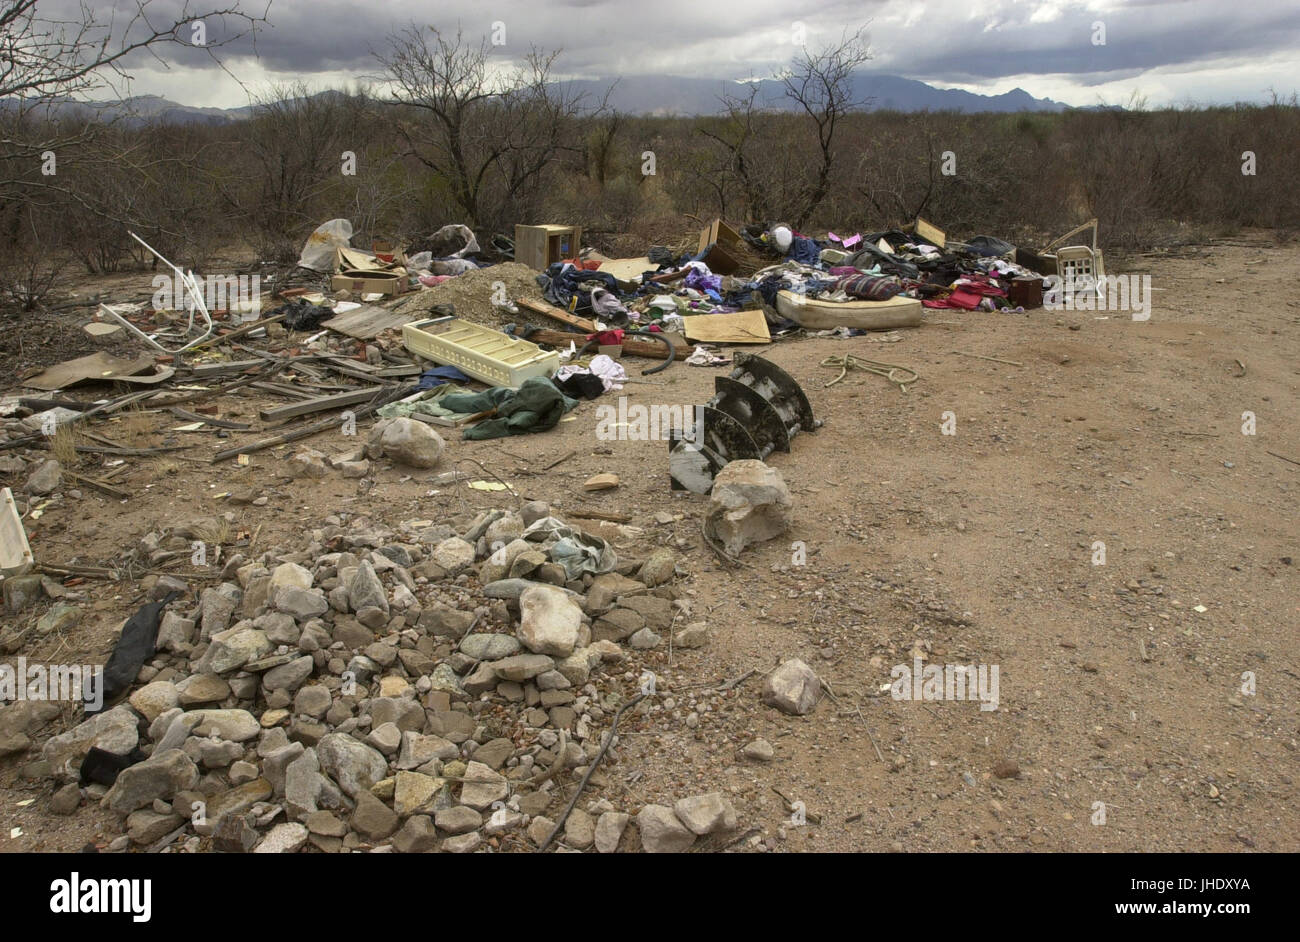 Discarded trash was dumped illegally on public land near Santa Rita Road, Sonoran Desert, Sahuarita, Arizona, USA. - Stock Image